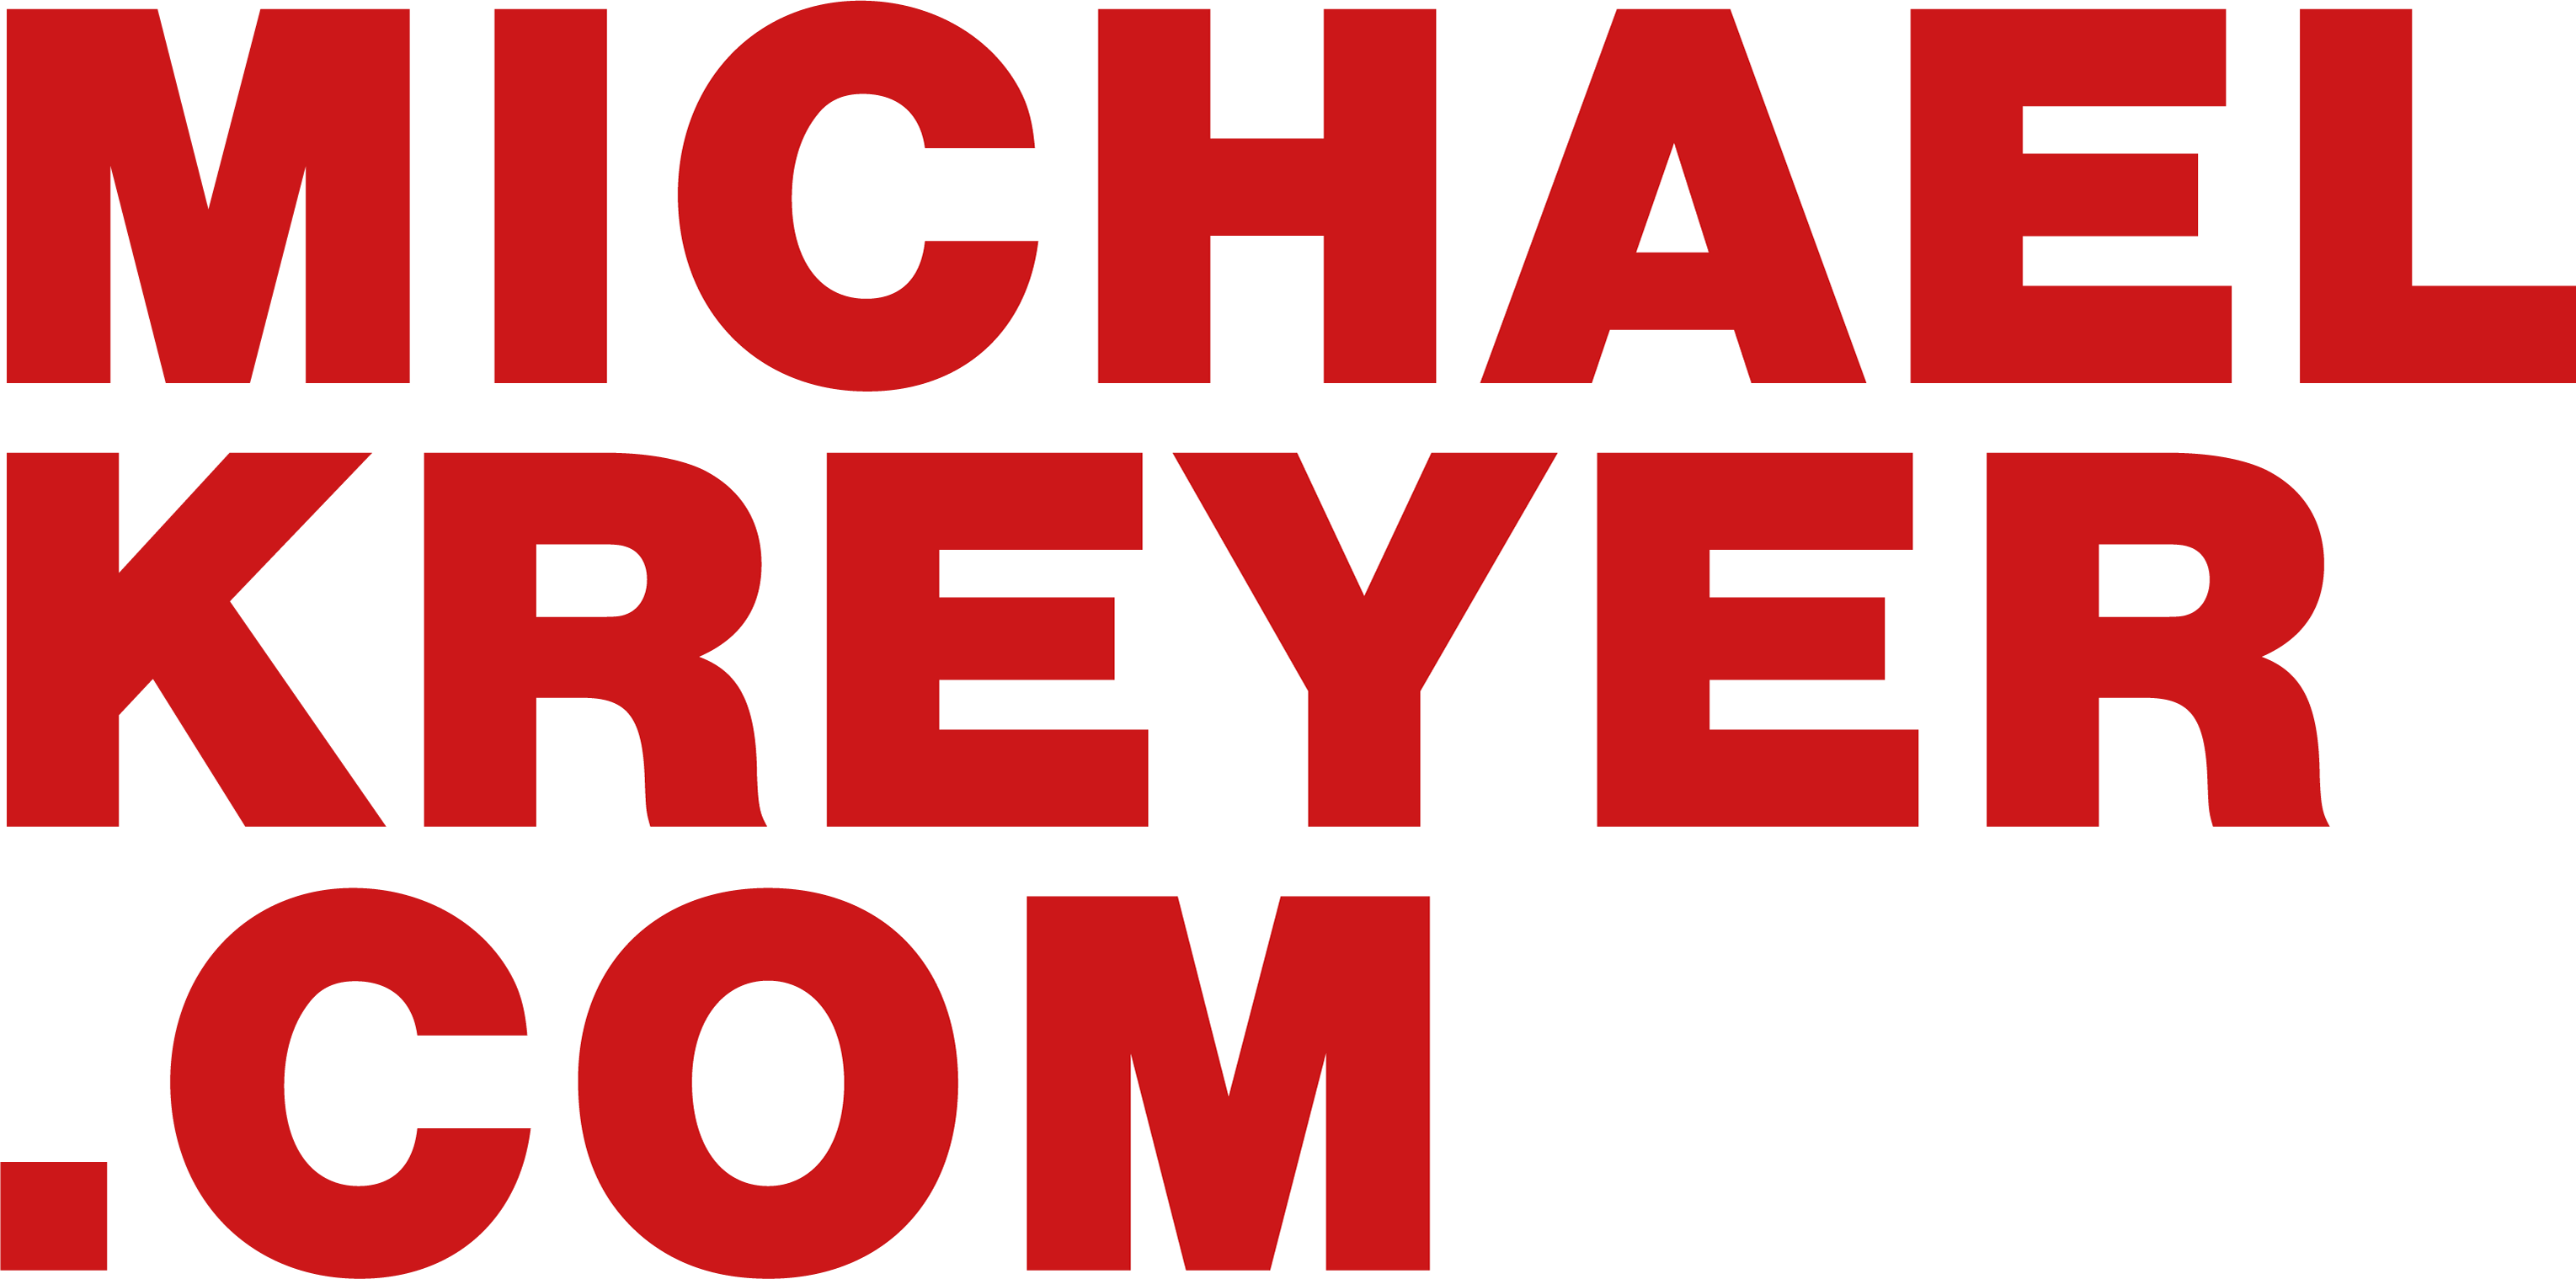 Michael Kreyer Fotografie Logo